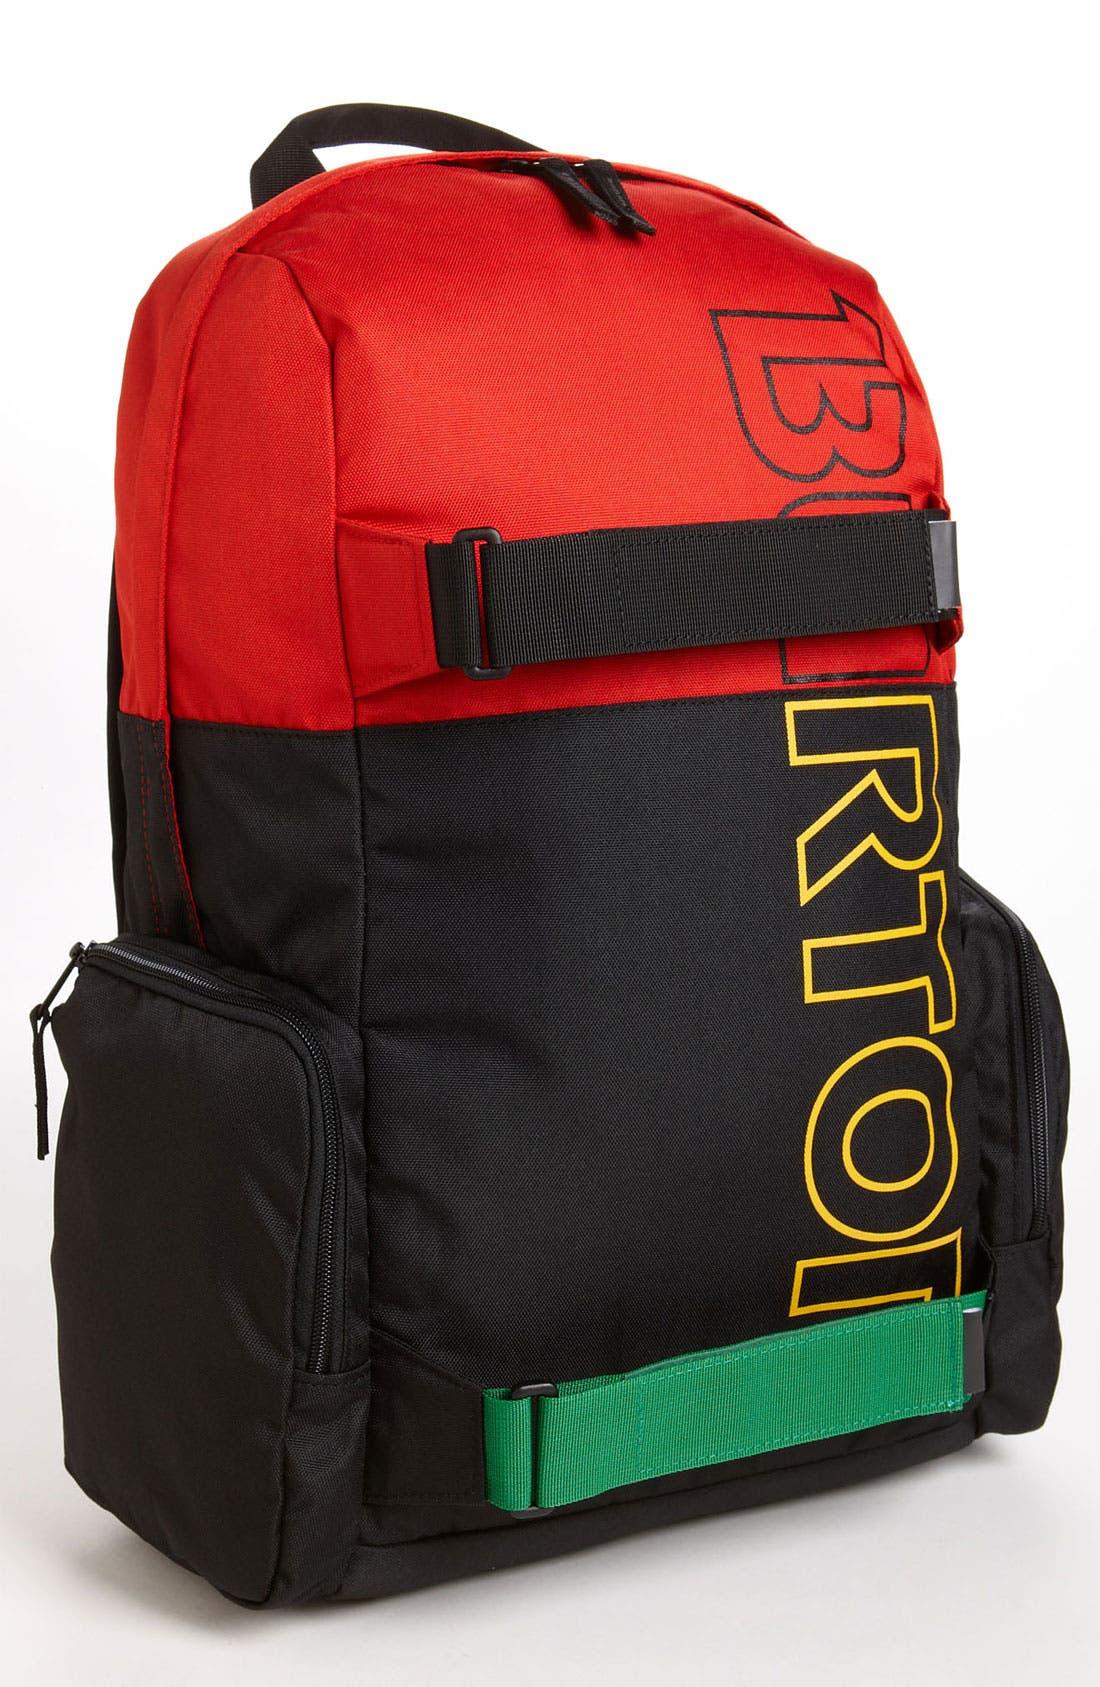 Alternate Image 1 Selected - Burton 'Emphasis' Backpack